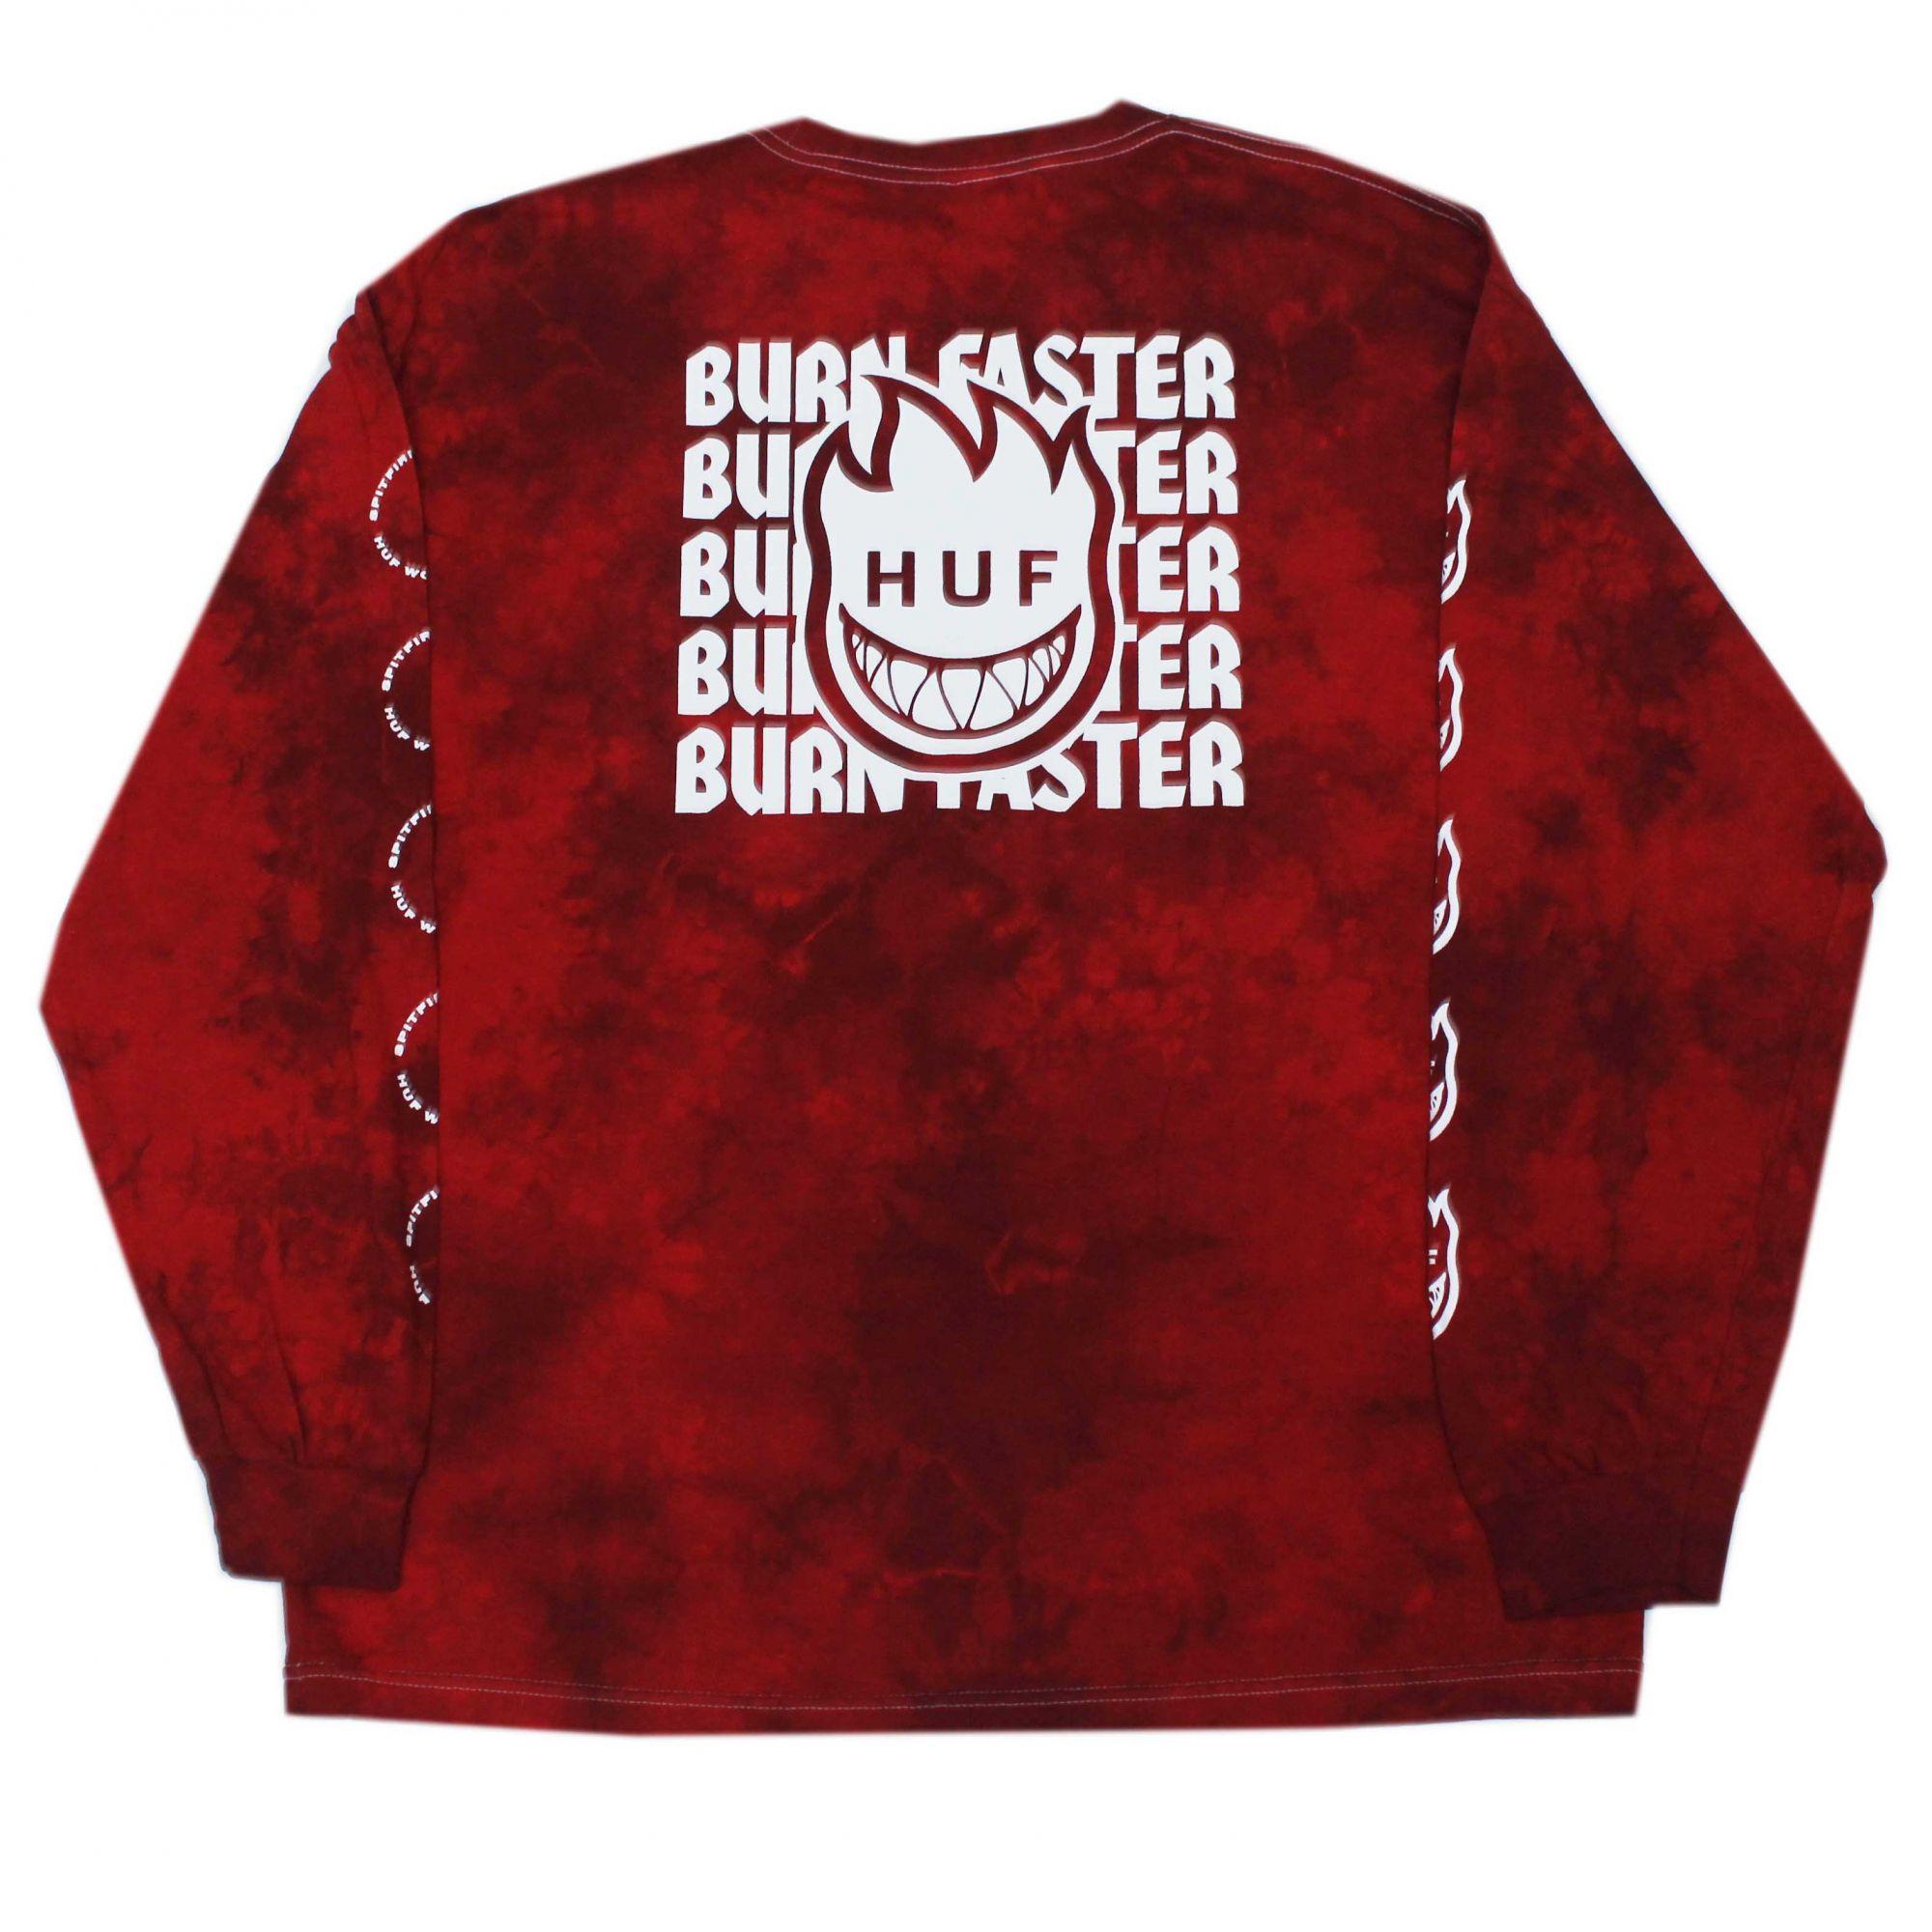 Camiseta Manga Longa HUF x Spitfire Burn Faster - Tie Dye Vermelho (Importado)